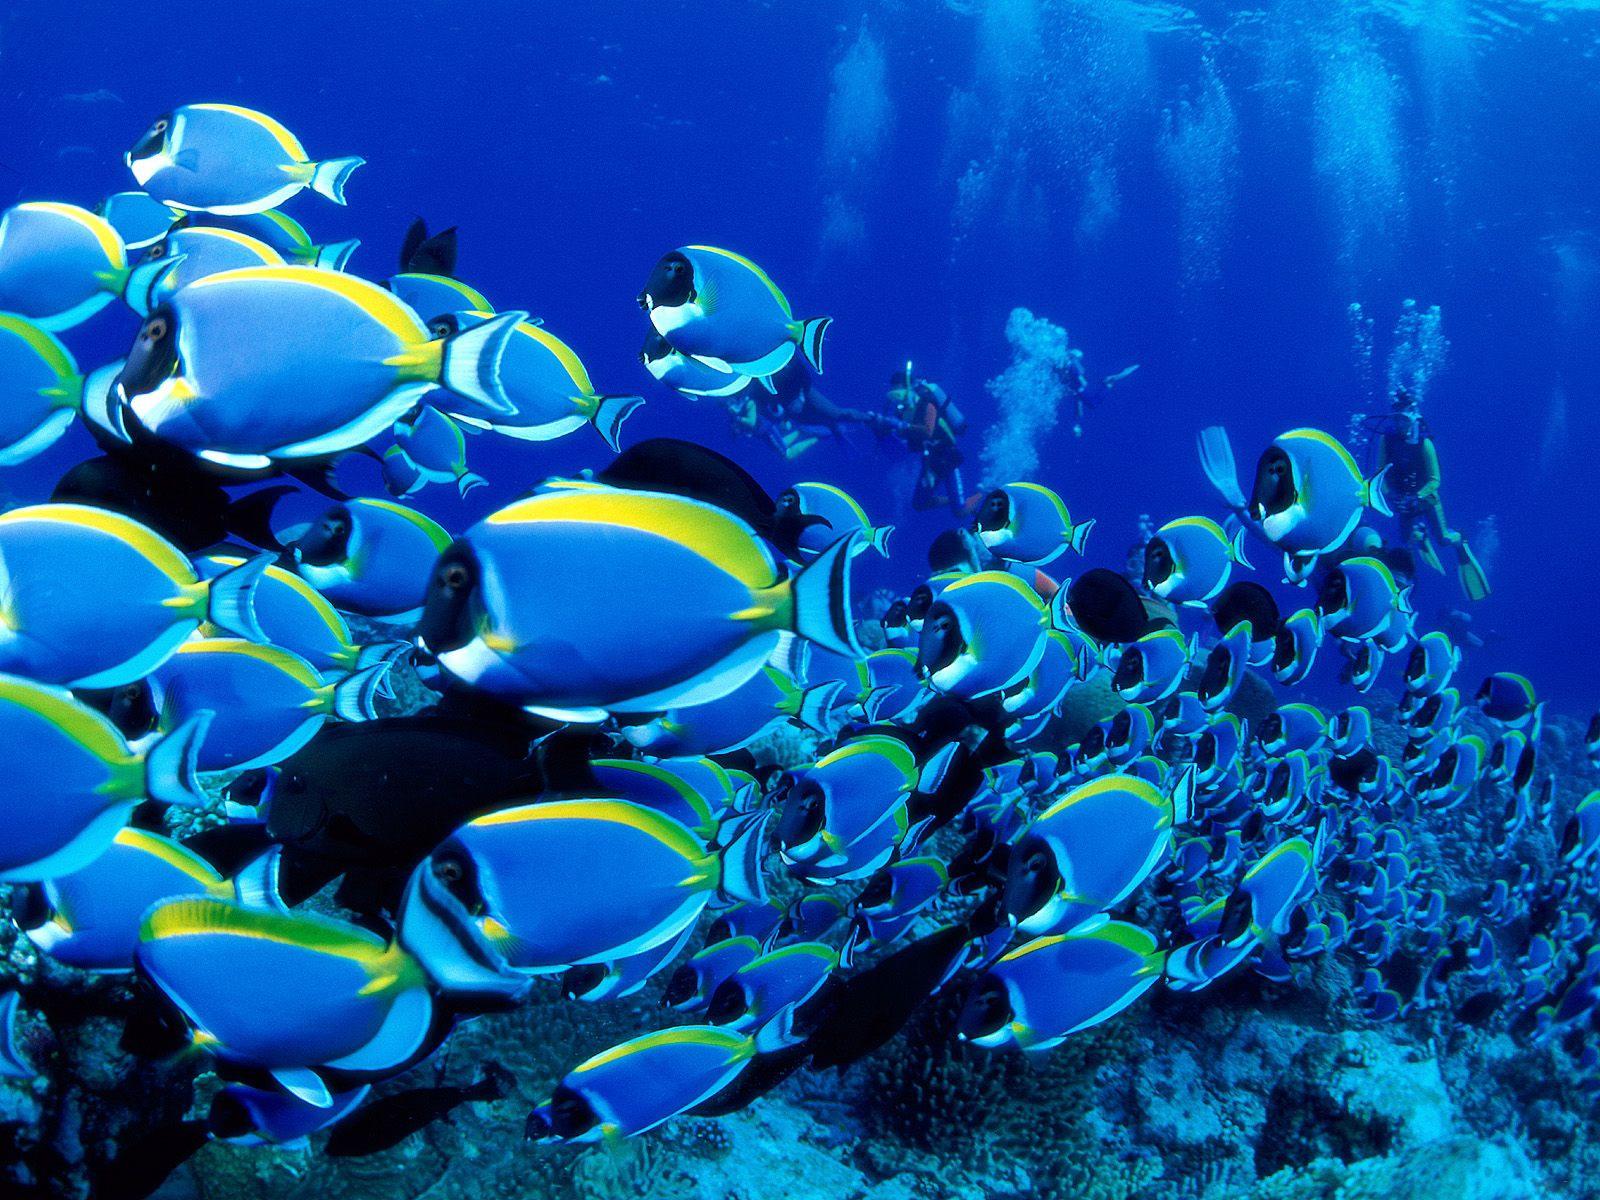 Best Wallpapers: Underwater Wallpapers HD